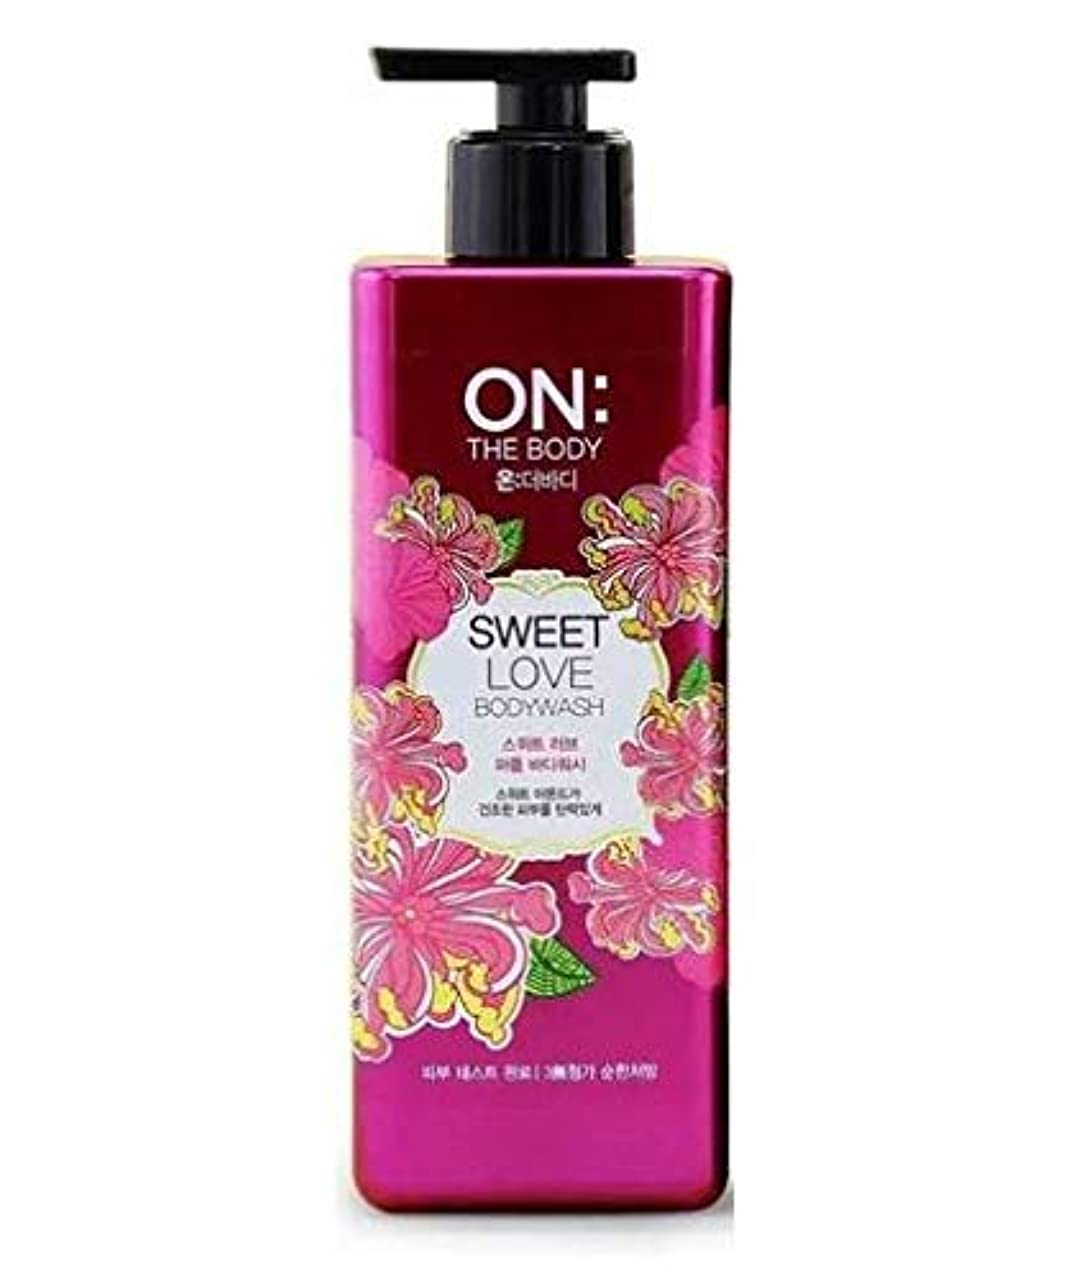 吸収剤通信網傘ON THE BODY Sweet Love Body Wash 500g/17.6oz